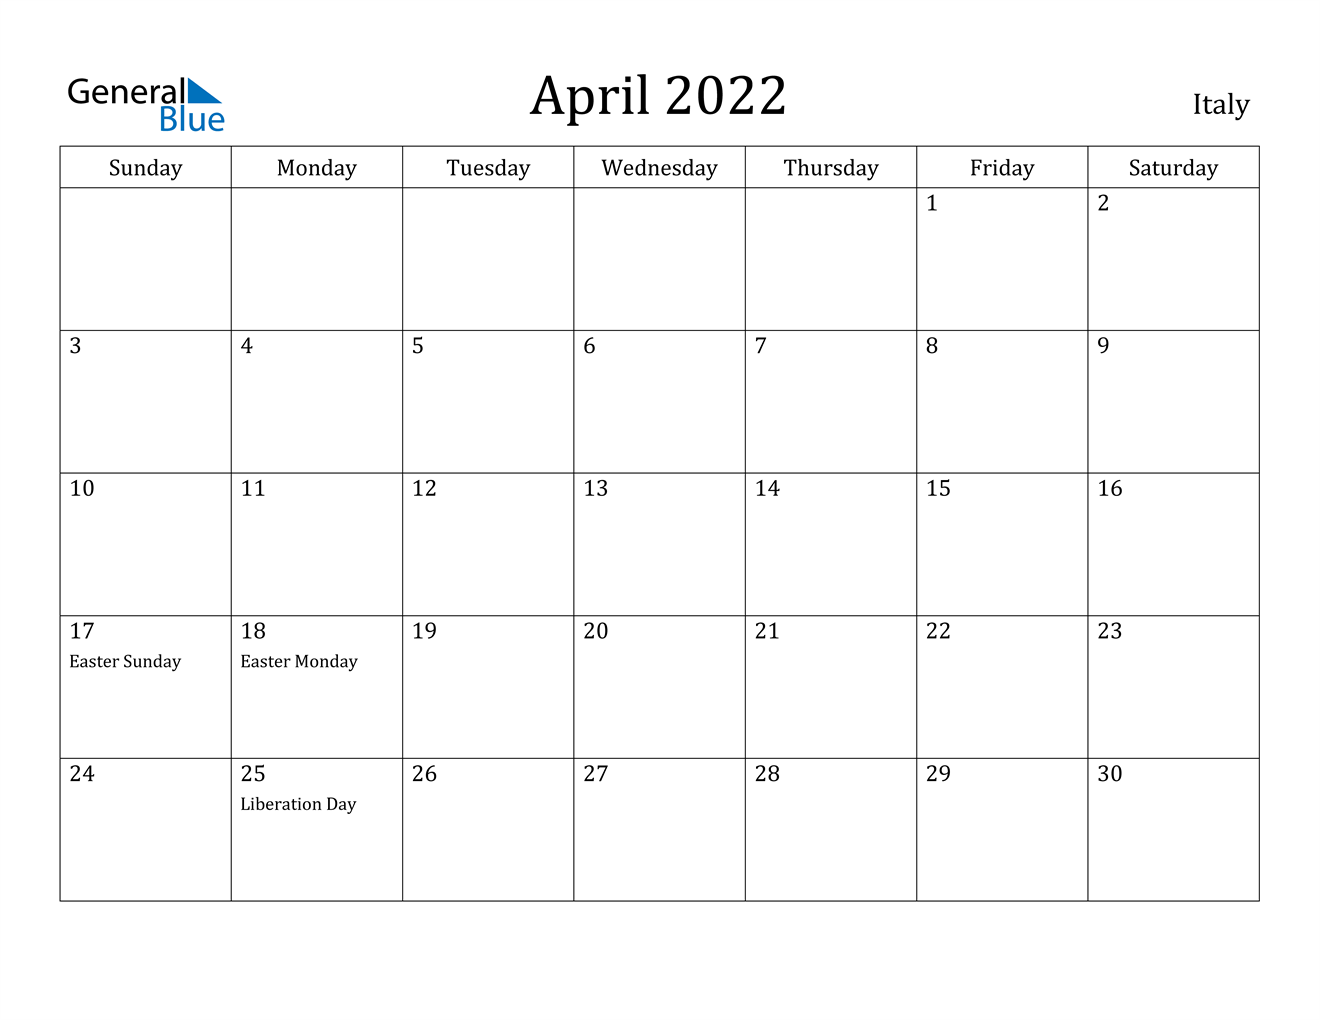 April 2022 Calendar - Italy Throughout March April 2022 Calendar Free Printable